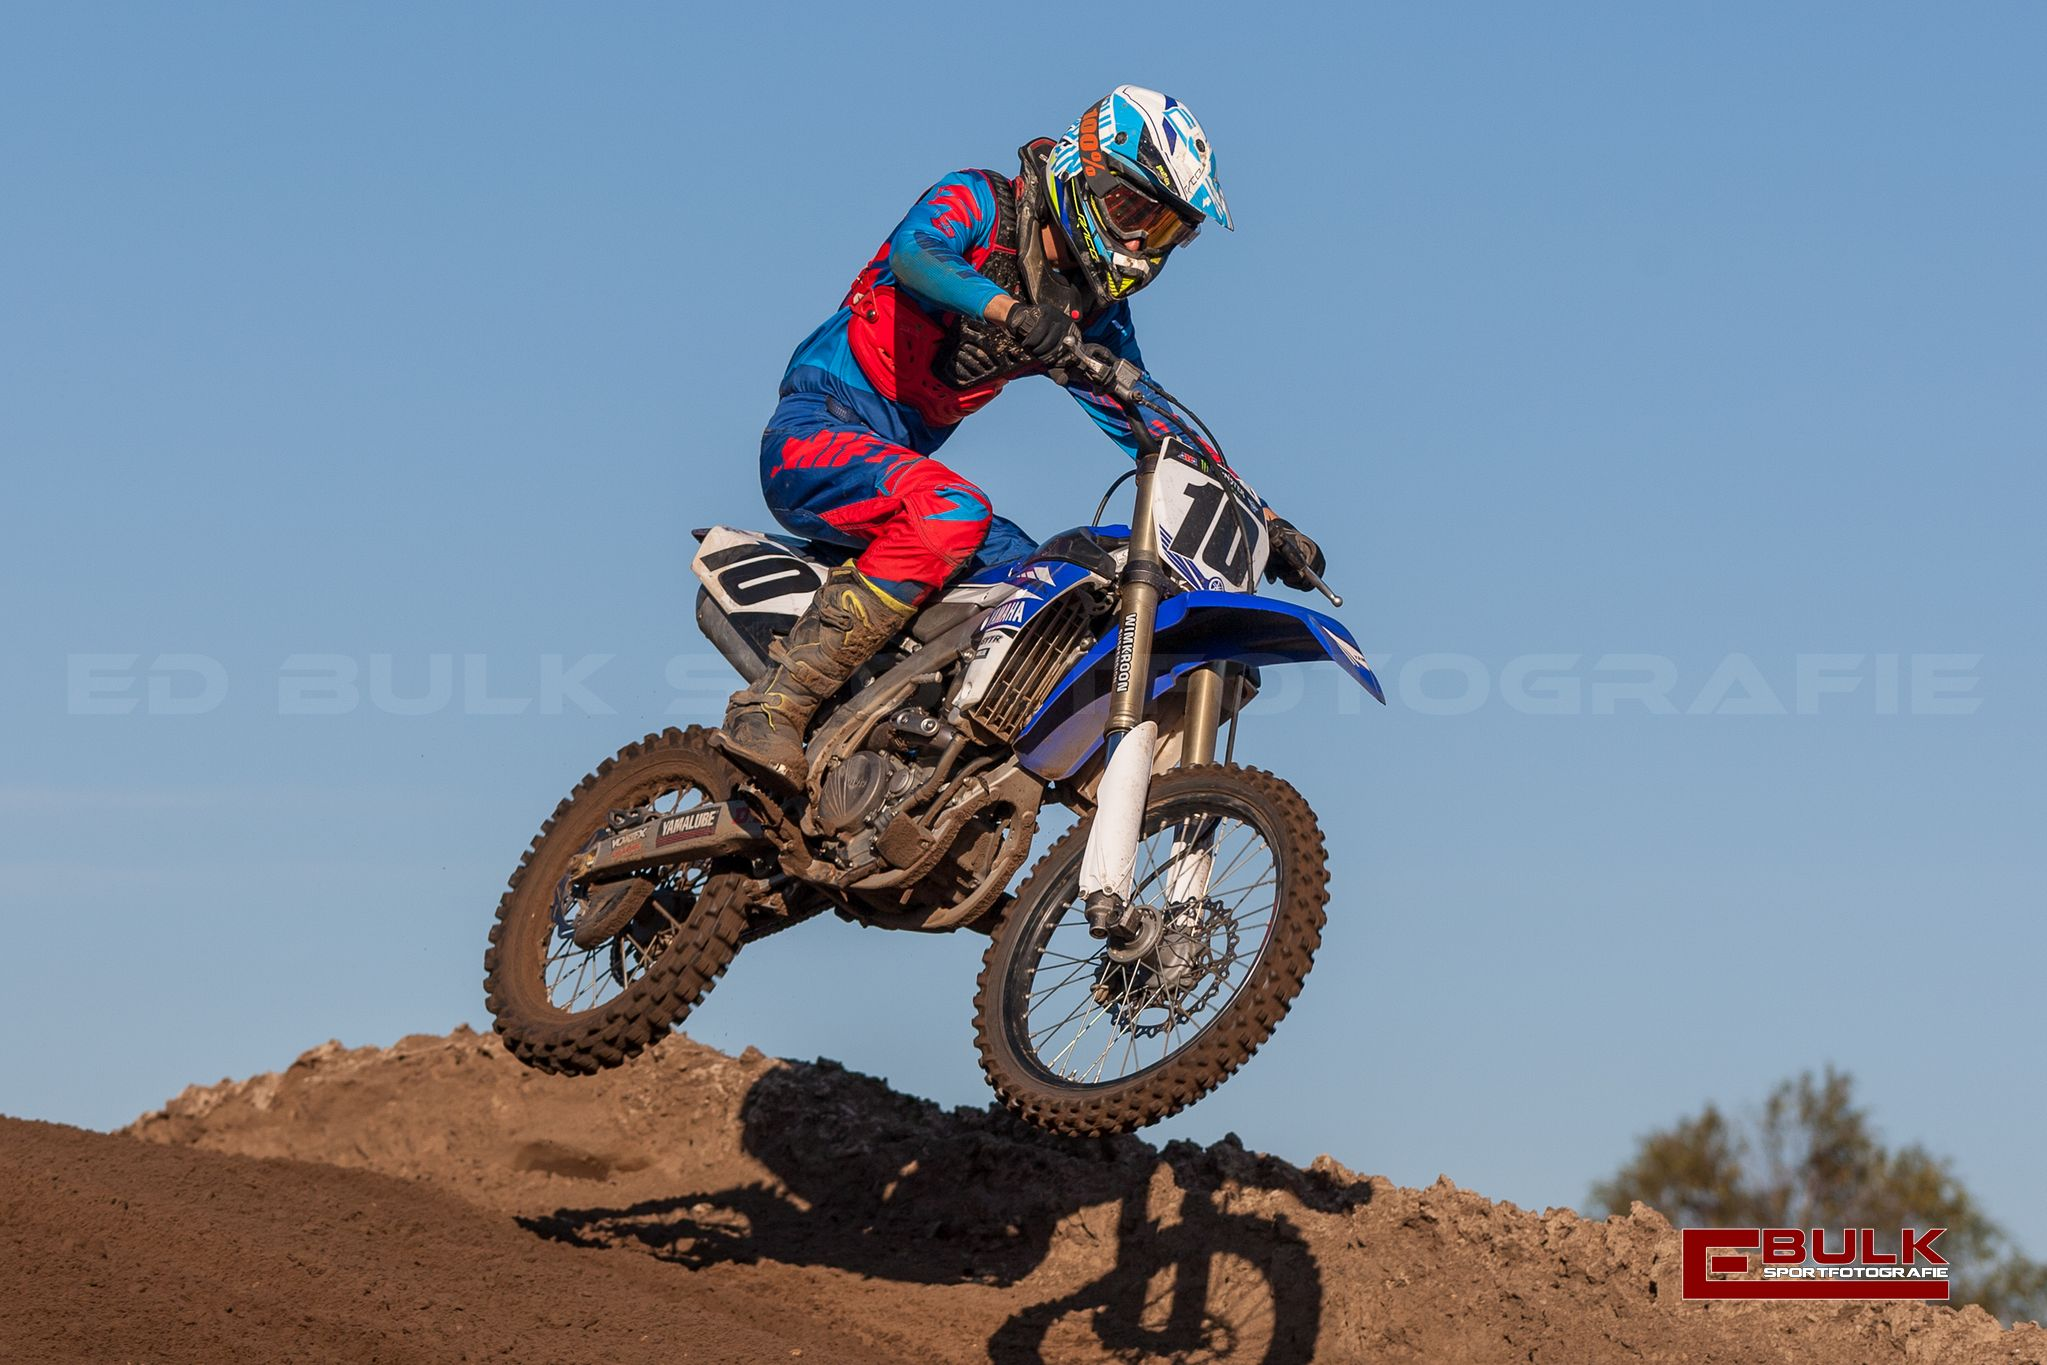 ebs_0333-ed_bulk_sportfotografie